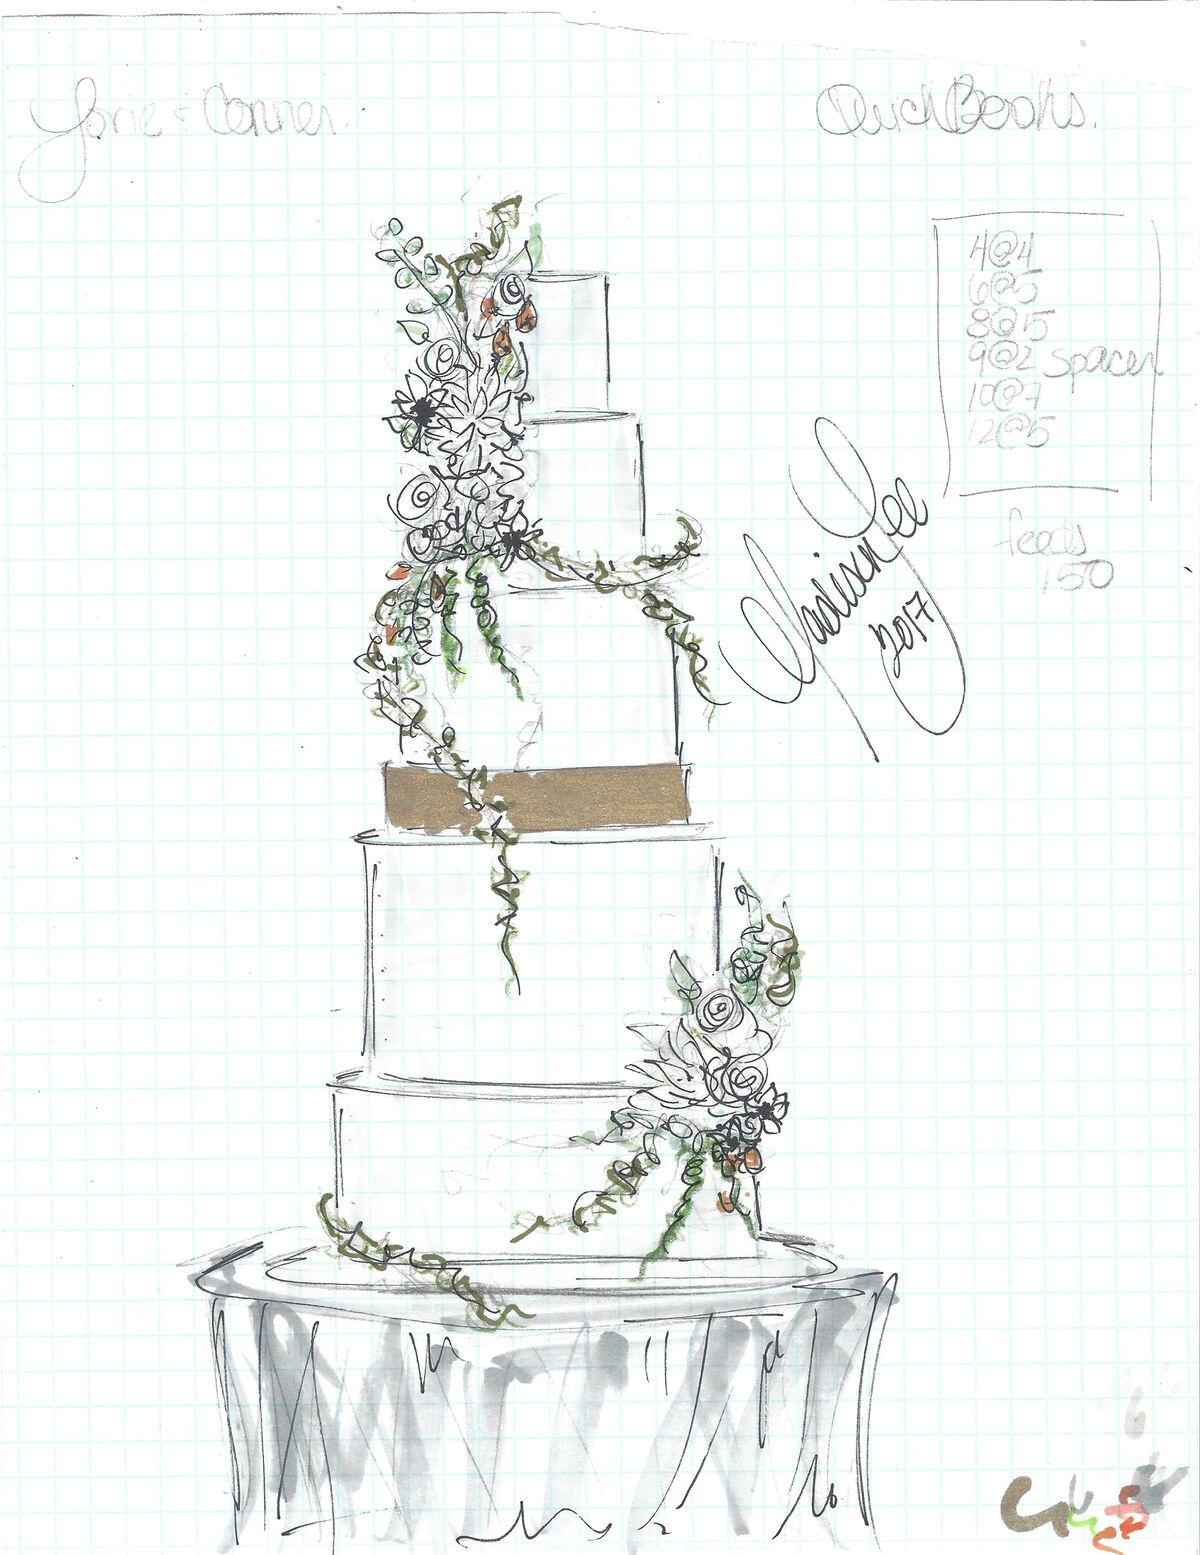 Wedding cake sketch by Madison Lee. Courtesy of Madison Lee's Cakes.